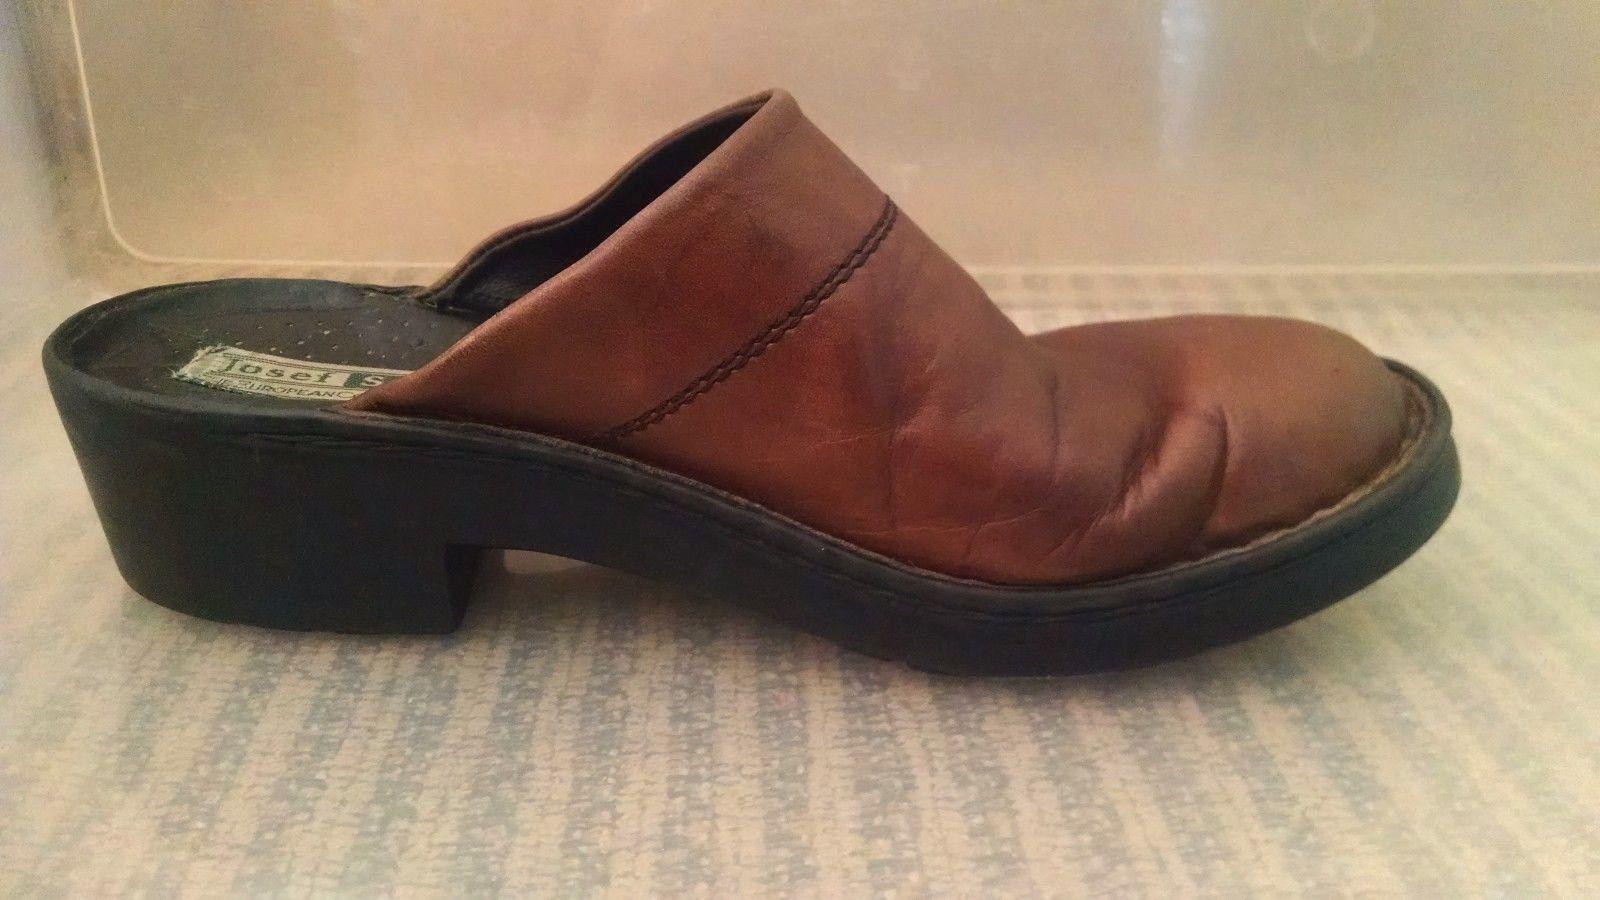 Josef Seibel Womens Clogs 38 EU 7 - 7.5 US Mules Slip On European Comfort Shoe image 2